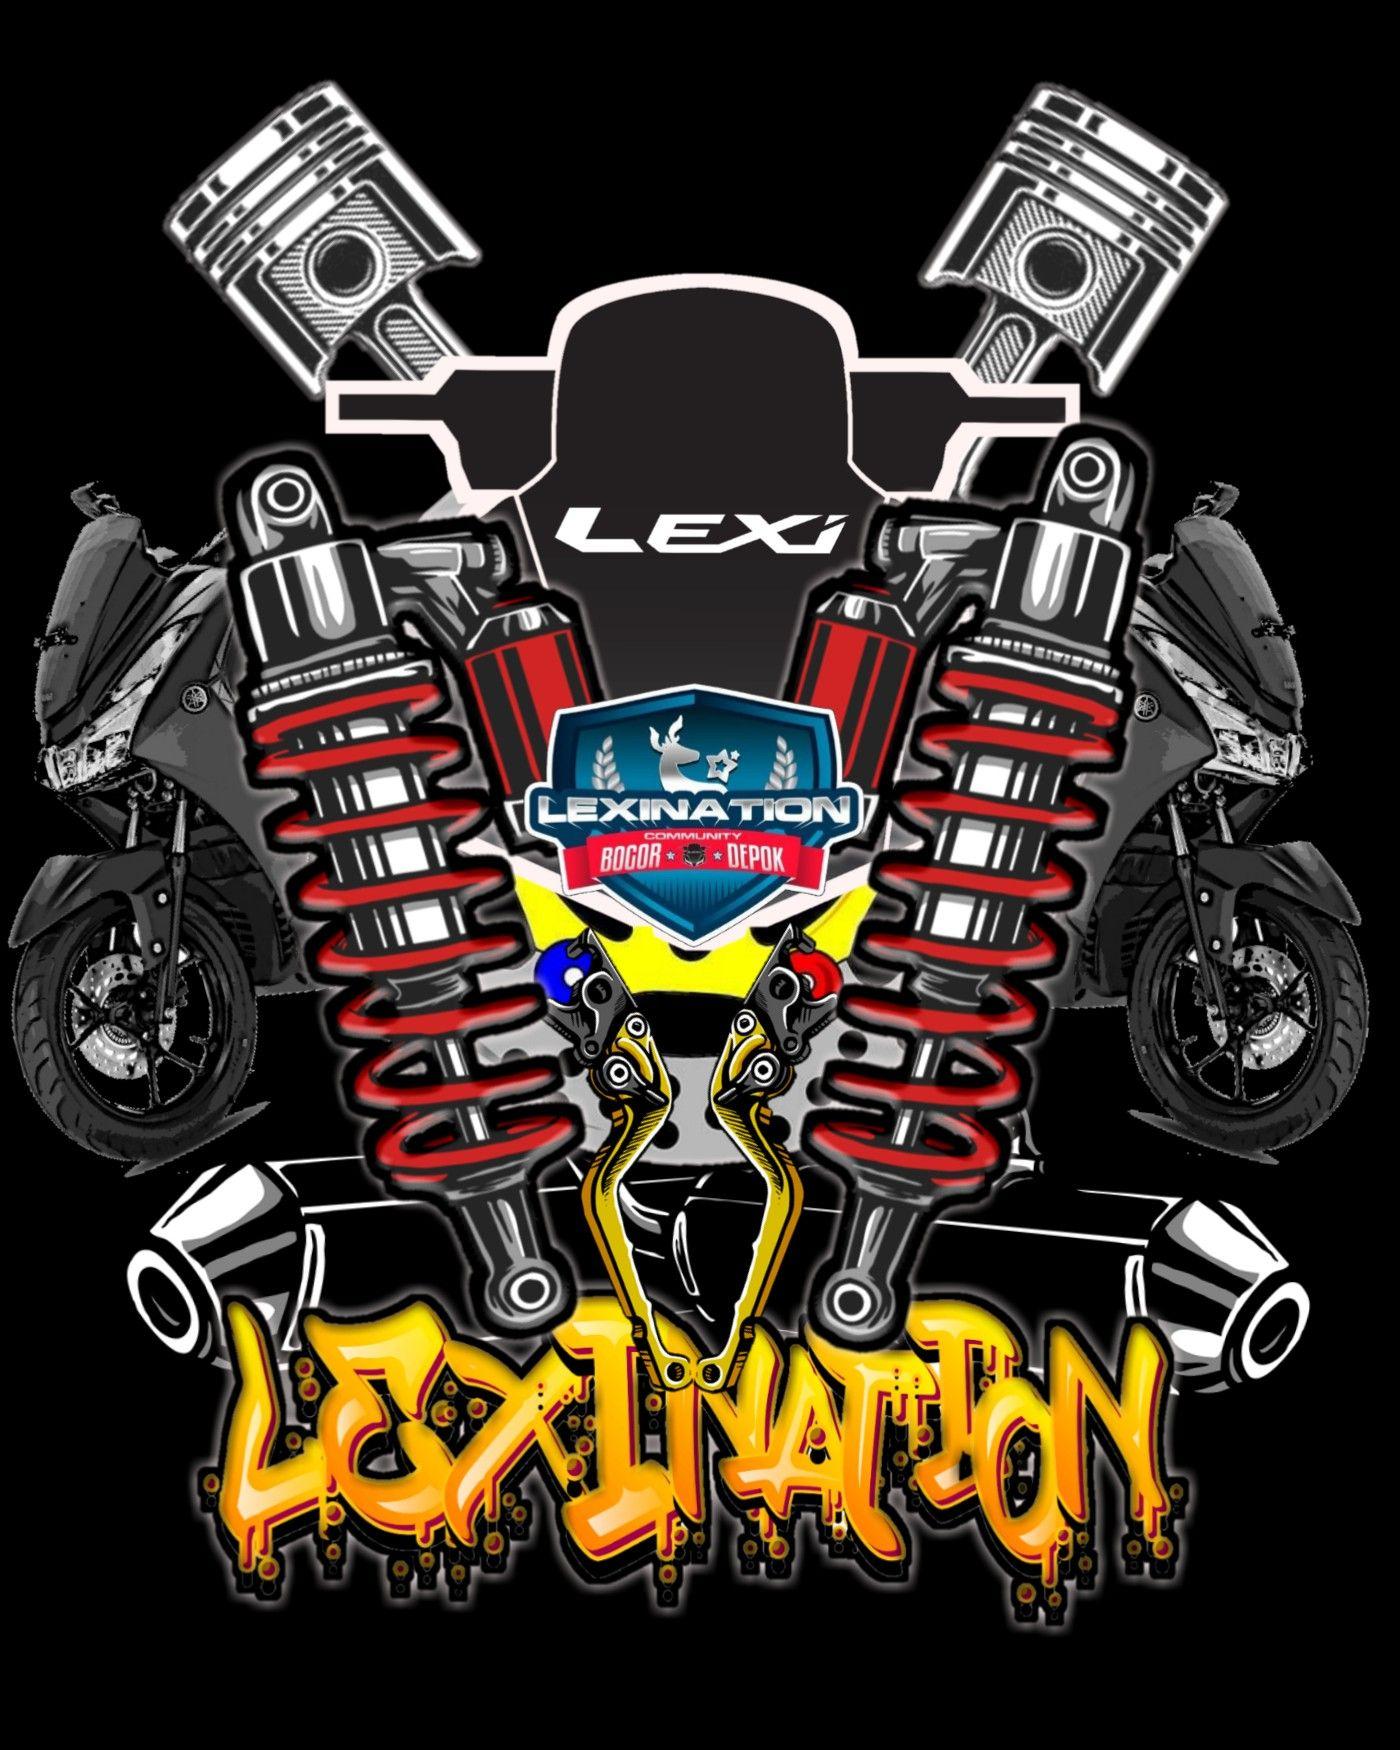 Lexination Thailook Seni jalanan 3d, Desain logo, Seni